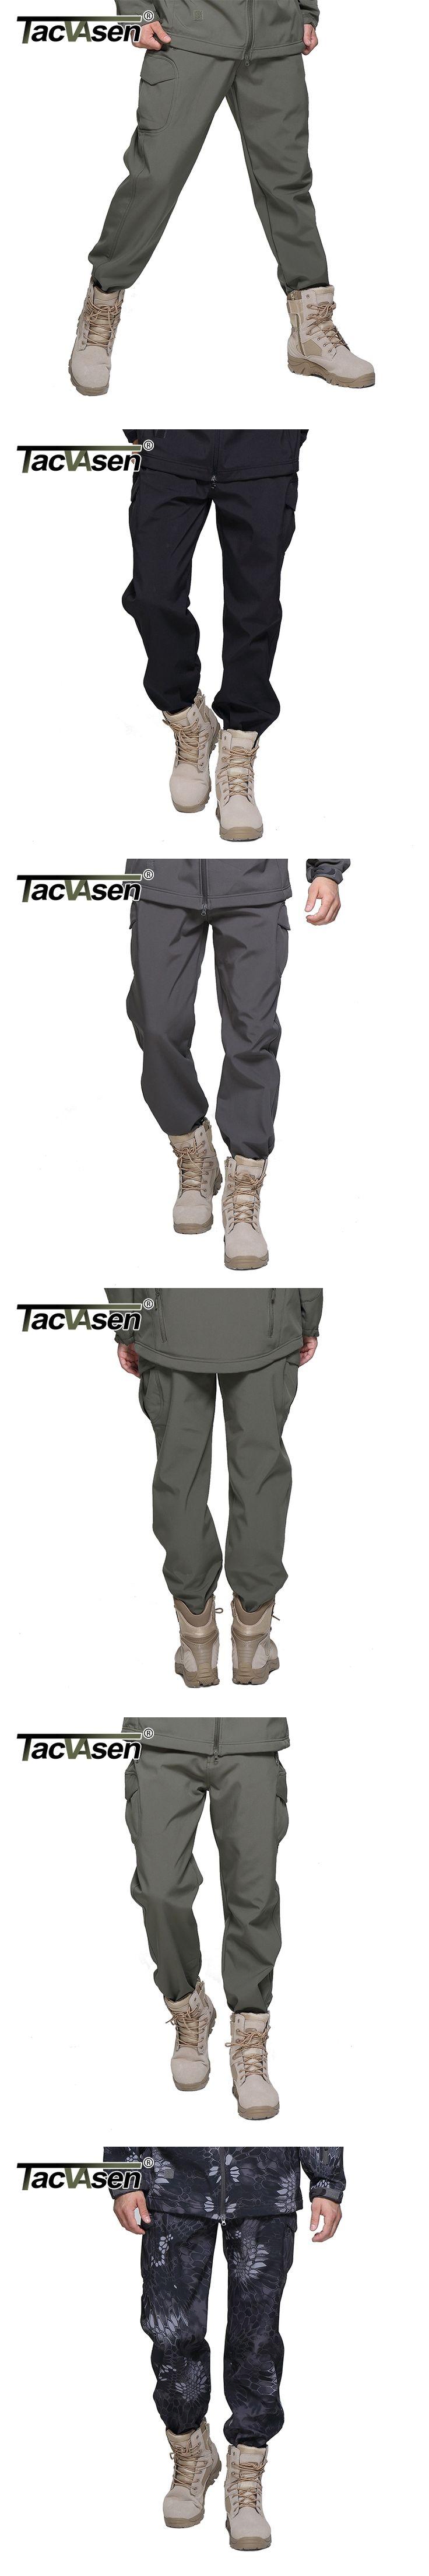 TACVASEN New Winter Shark Skin Soft Shell Tactical Military Camouflage Pants Men Waterproof  Warm Paintball Army Fleece Pant